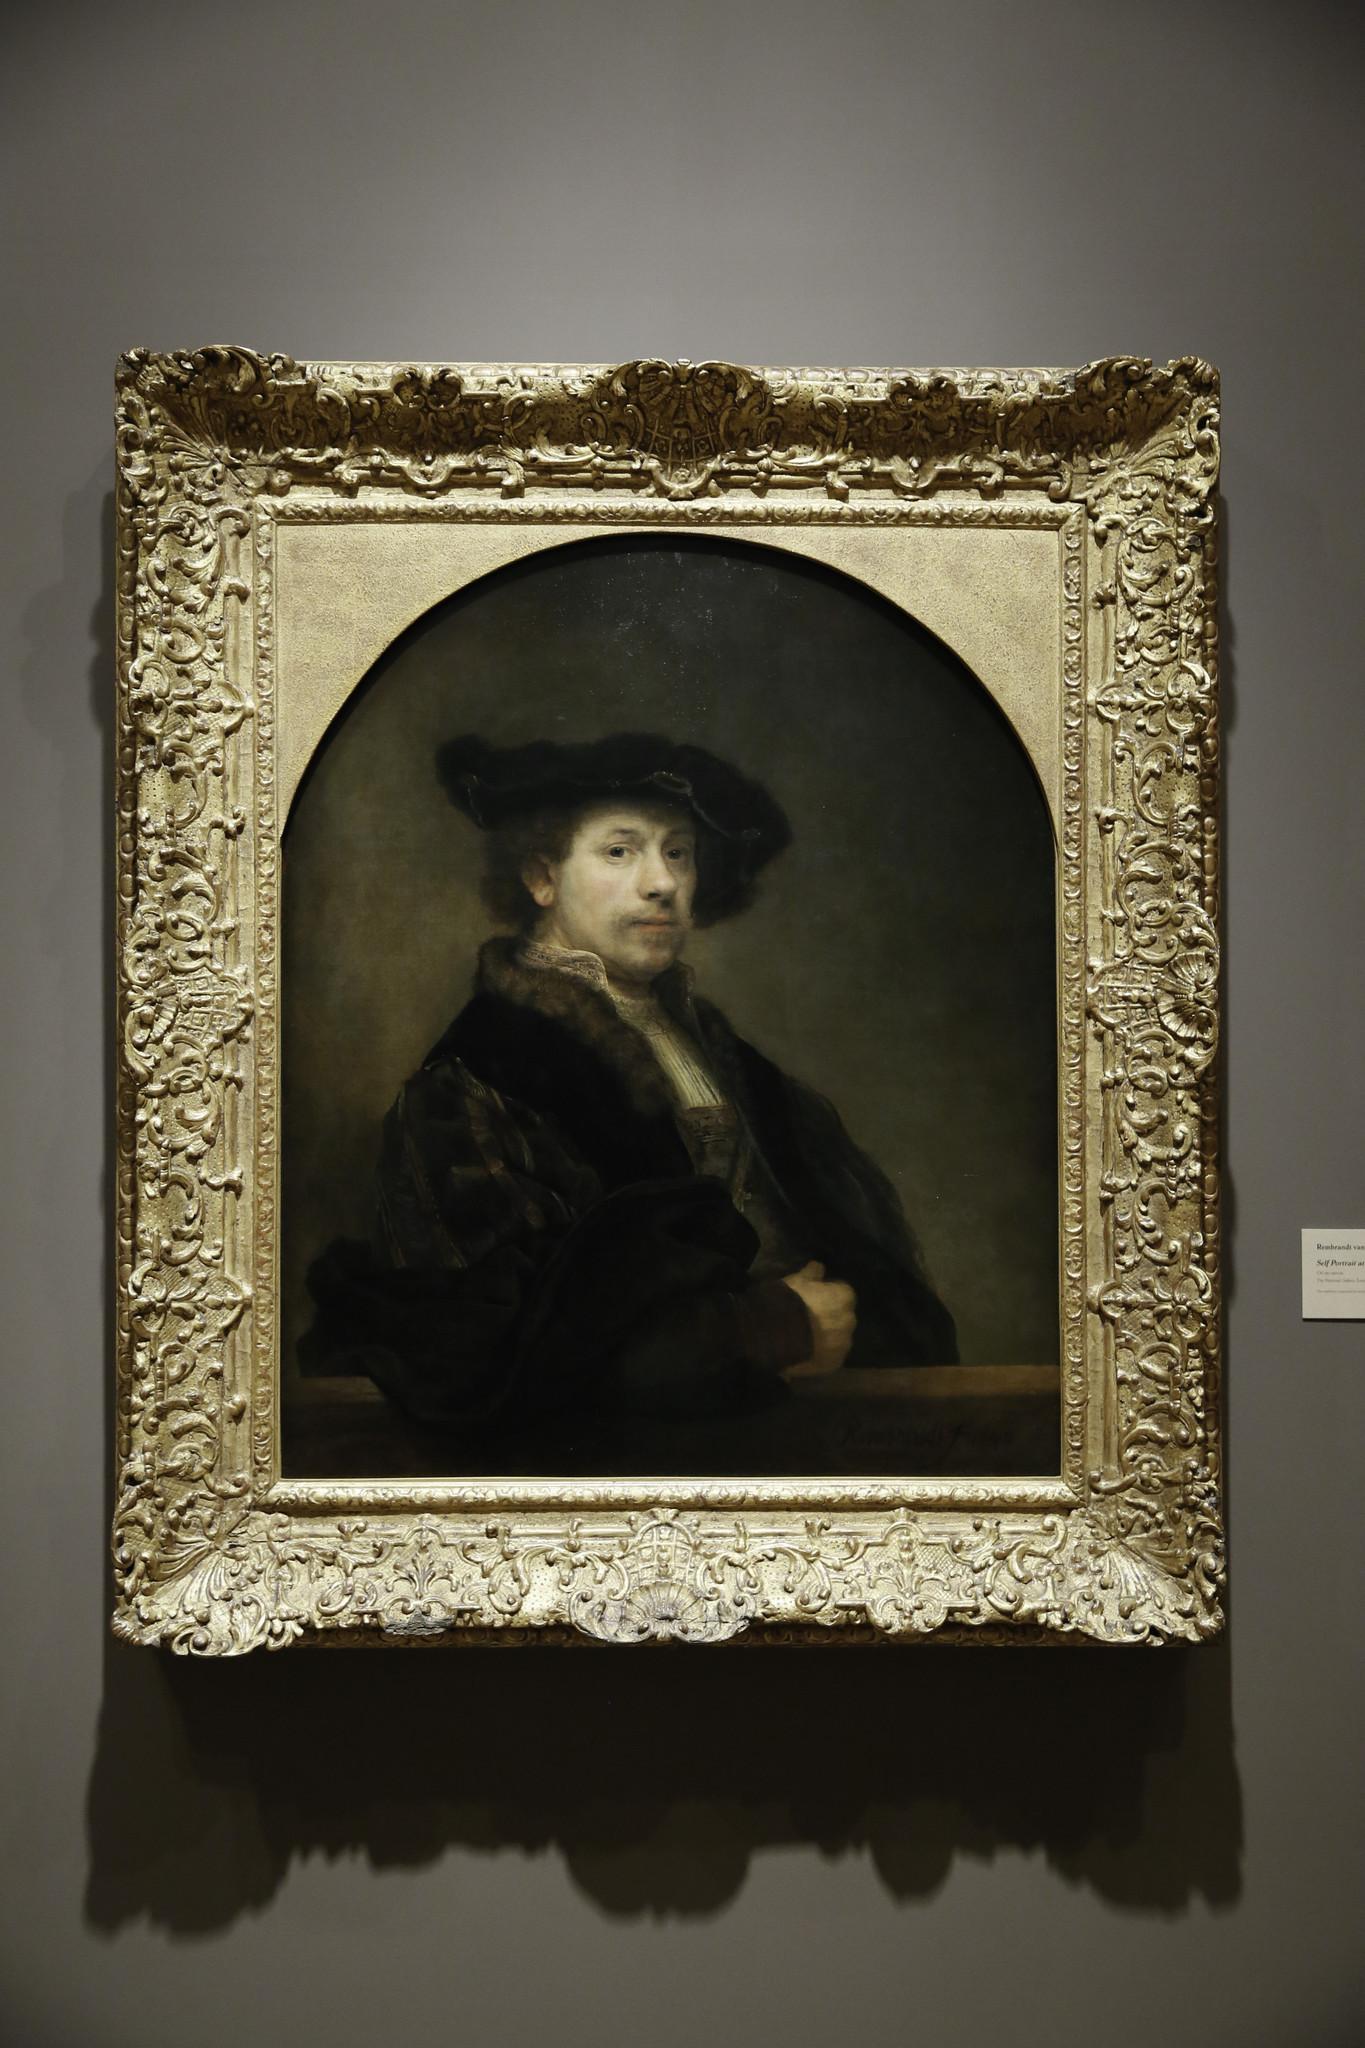 Rembrandt self-portrait at the Norton Simon